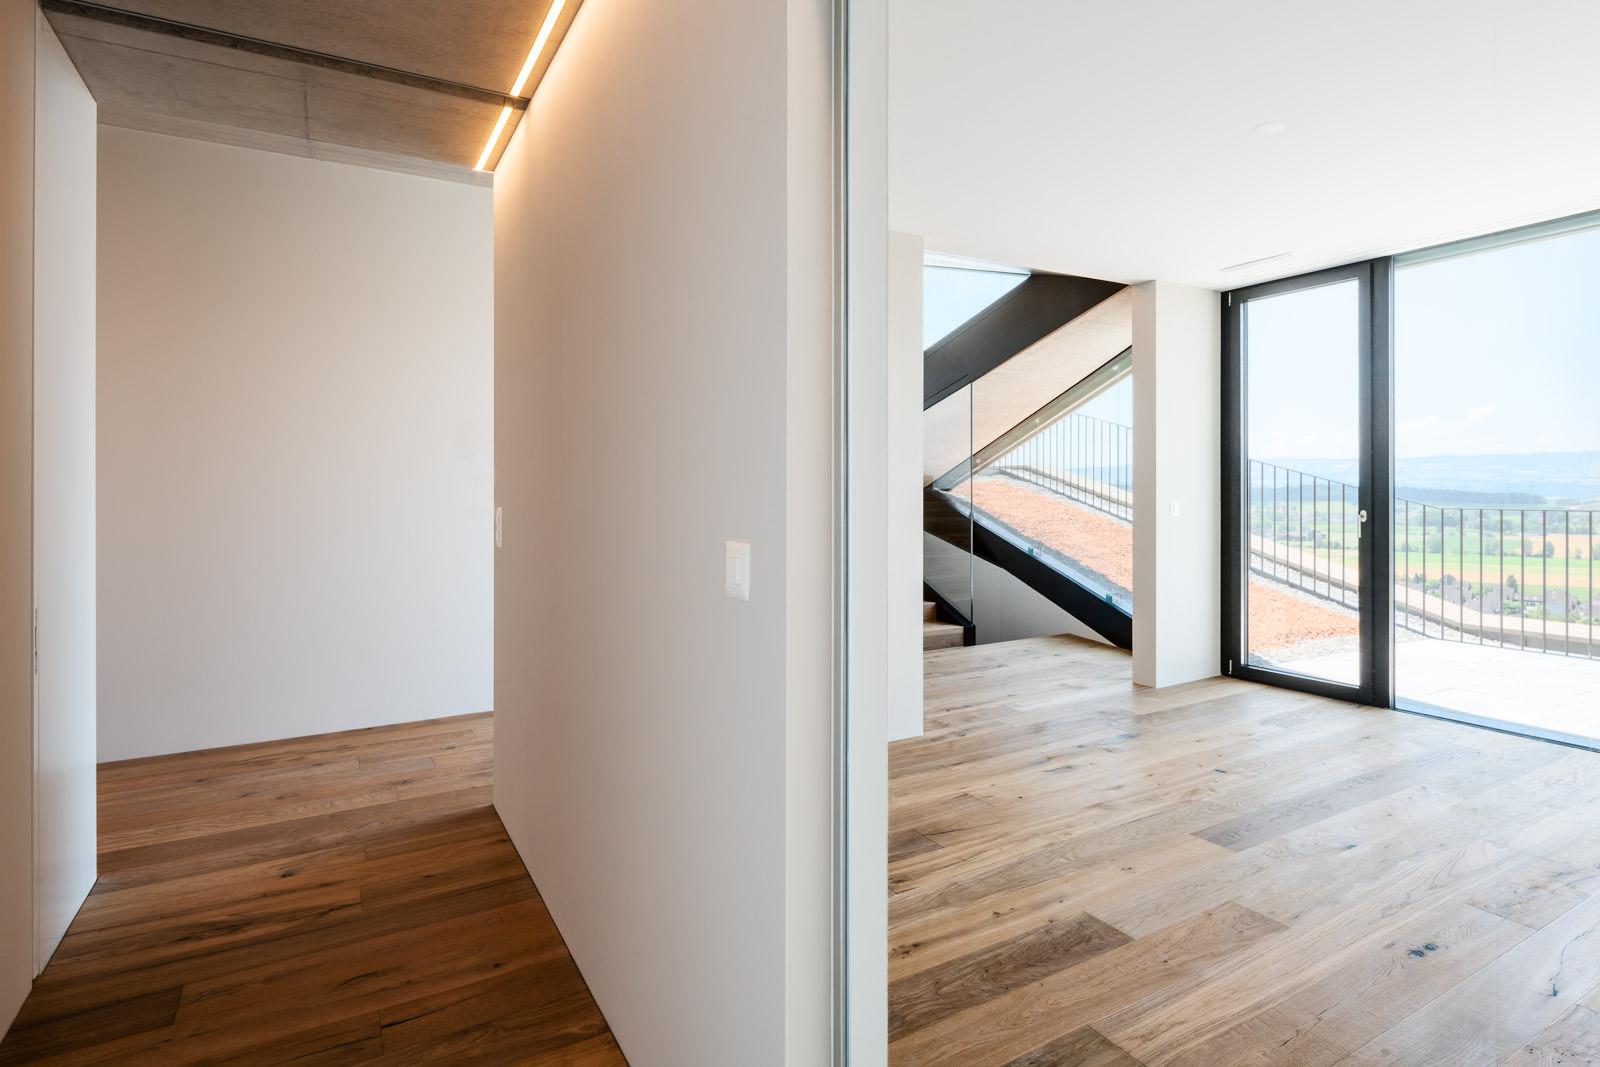 Immobilienfotografie - Interieur Fotos - Immobilienmarkt Verkaufsobjekt